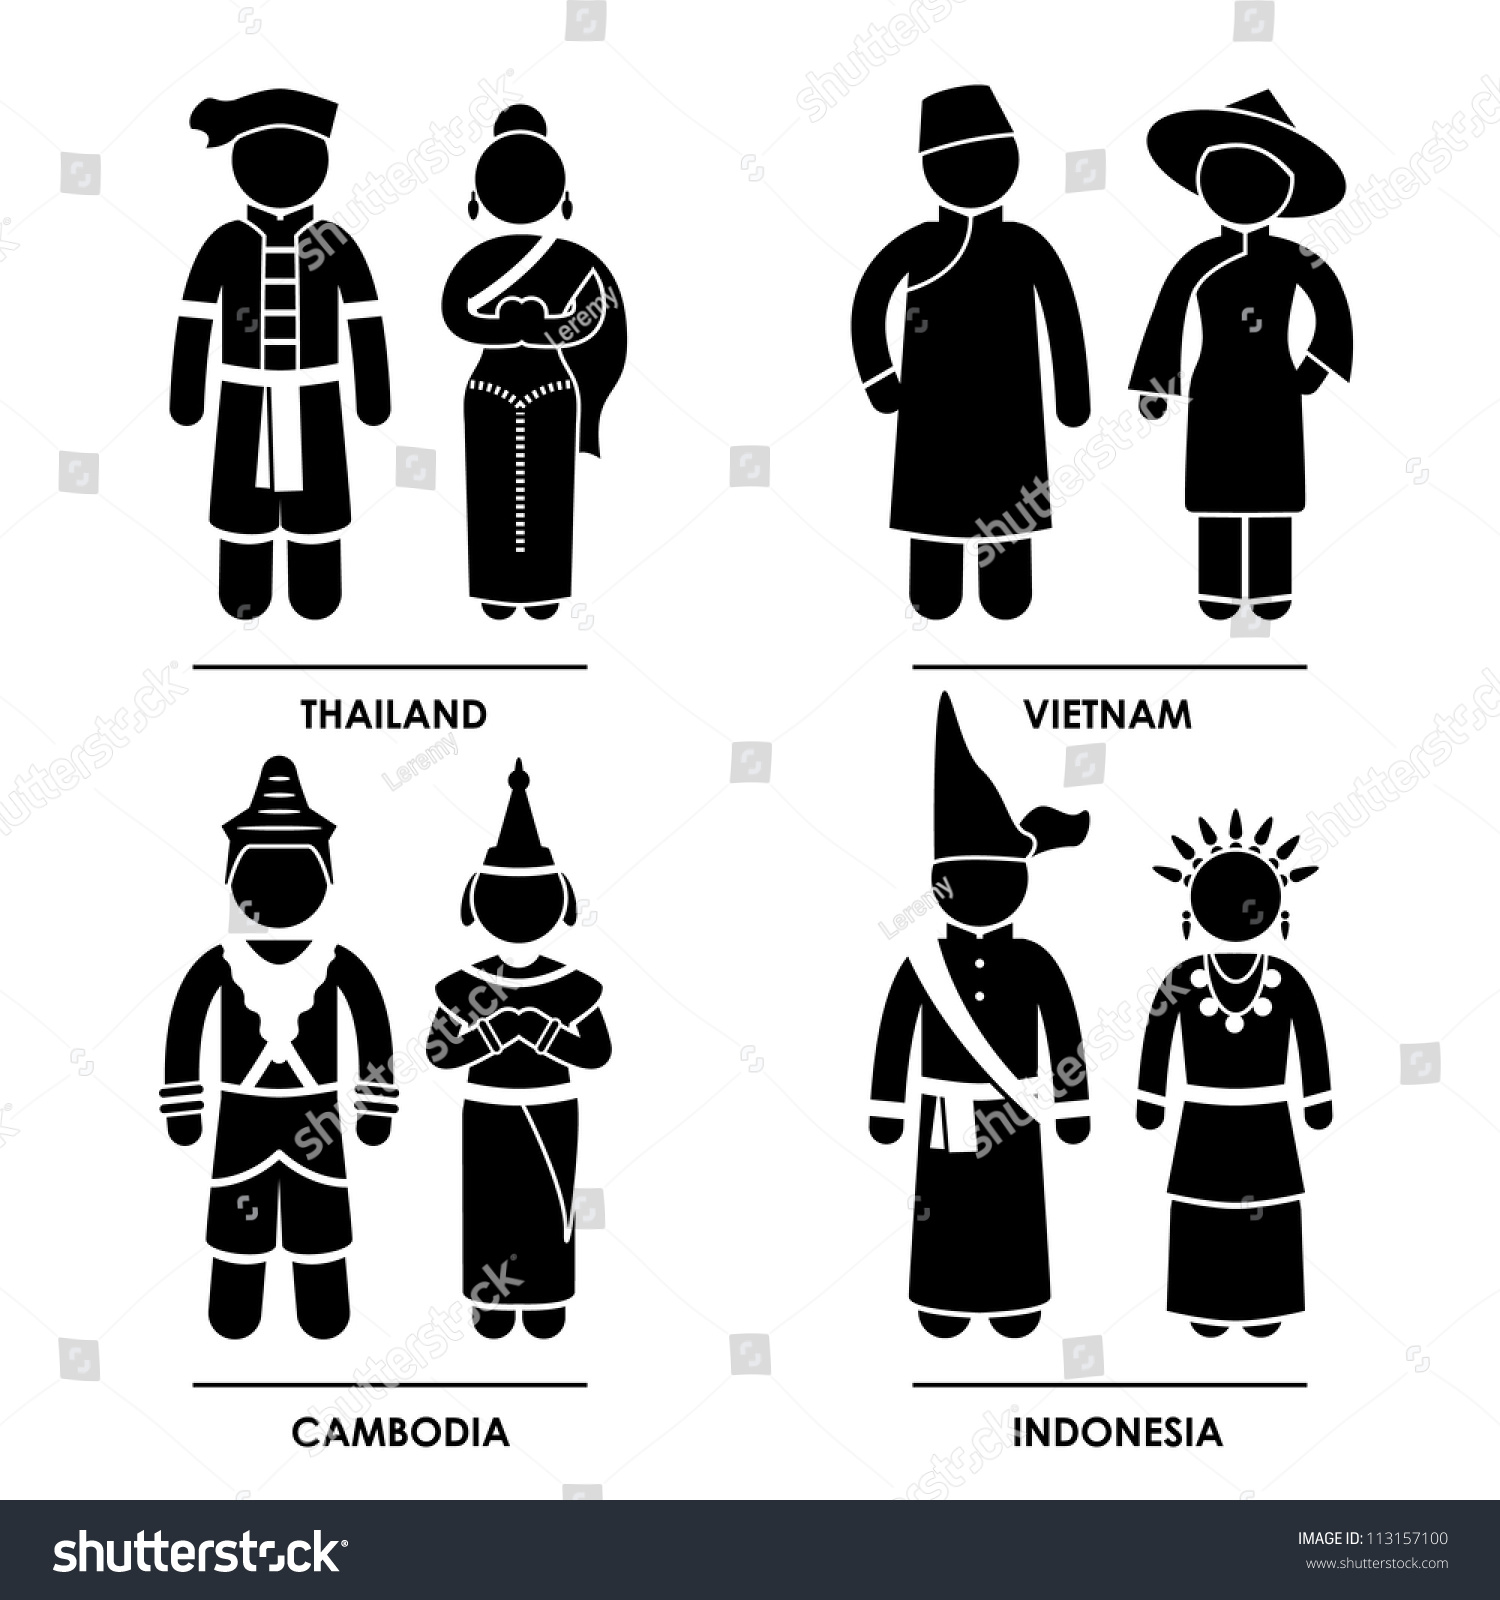 Southeast asia thailand vietnam cambodia indonesia stock vector southeast asia thailand vietnam cambodia indonesia man woman people national traditional costume dress clothing icon biocorpaavc